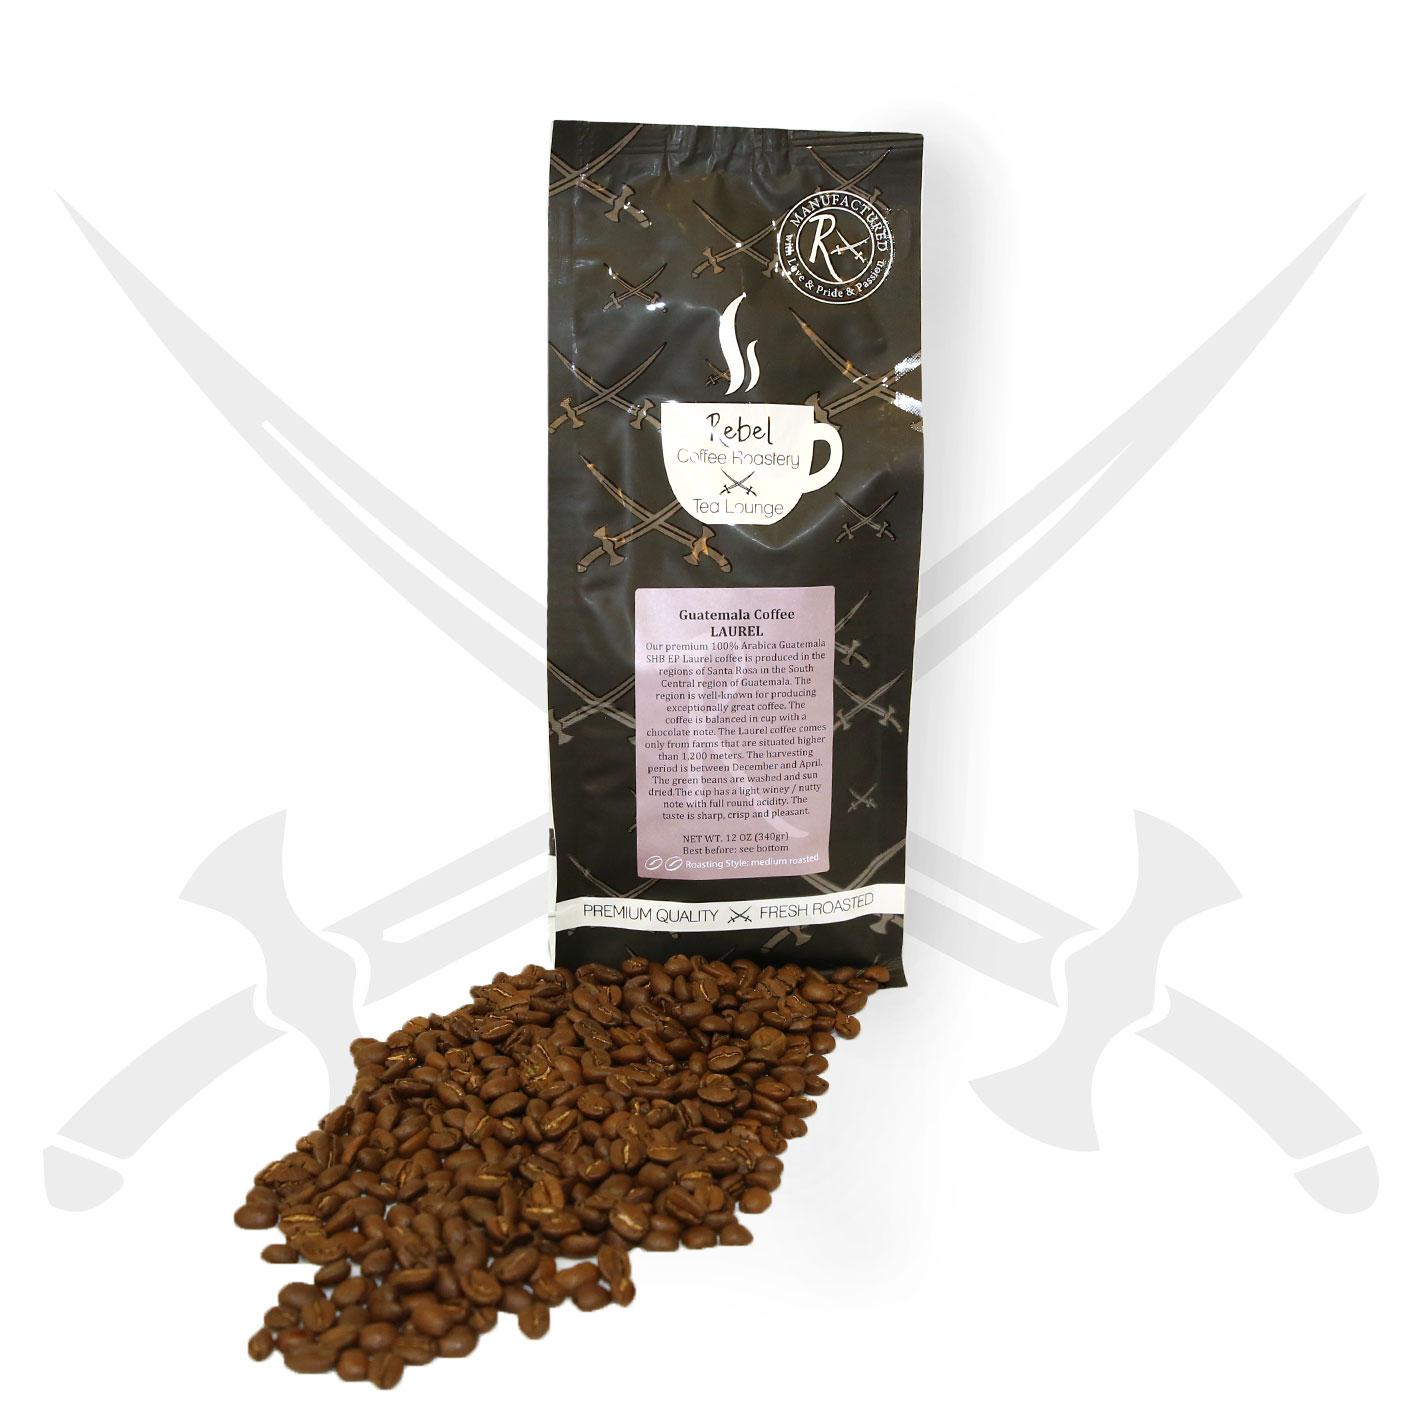 Guatemala_Coffee_Laurel